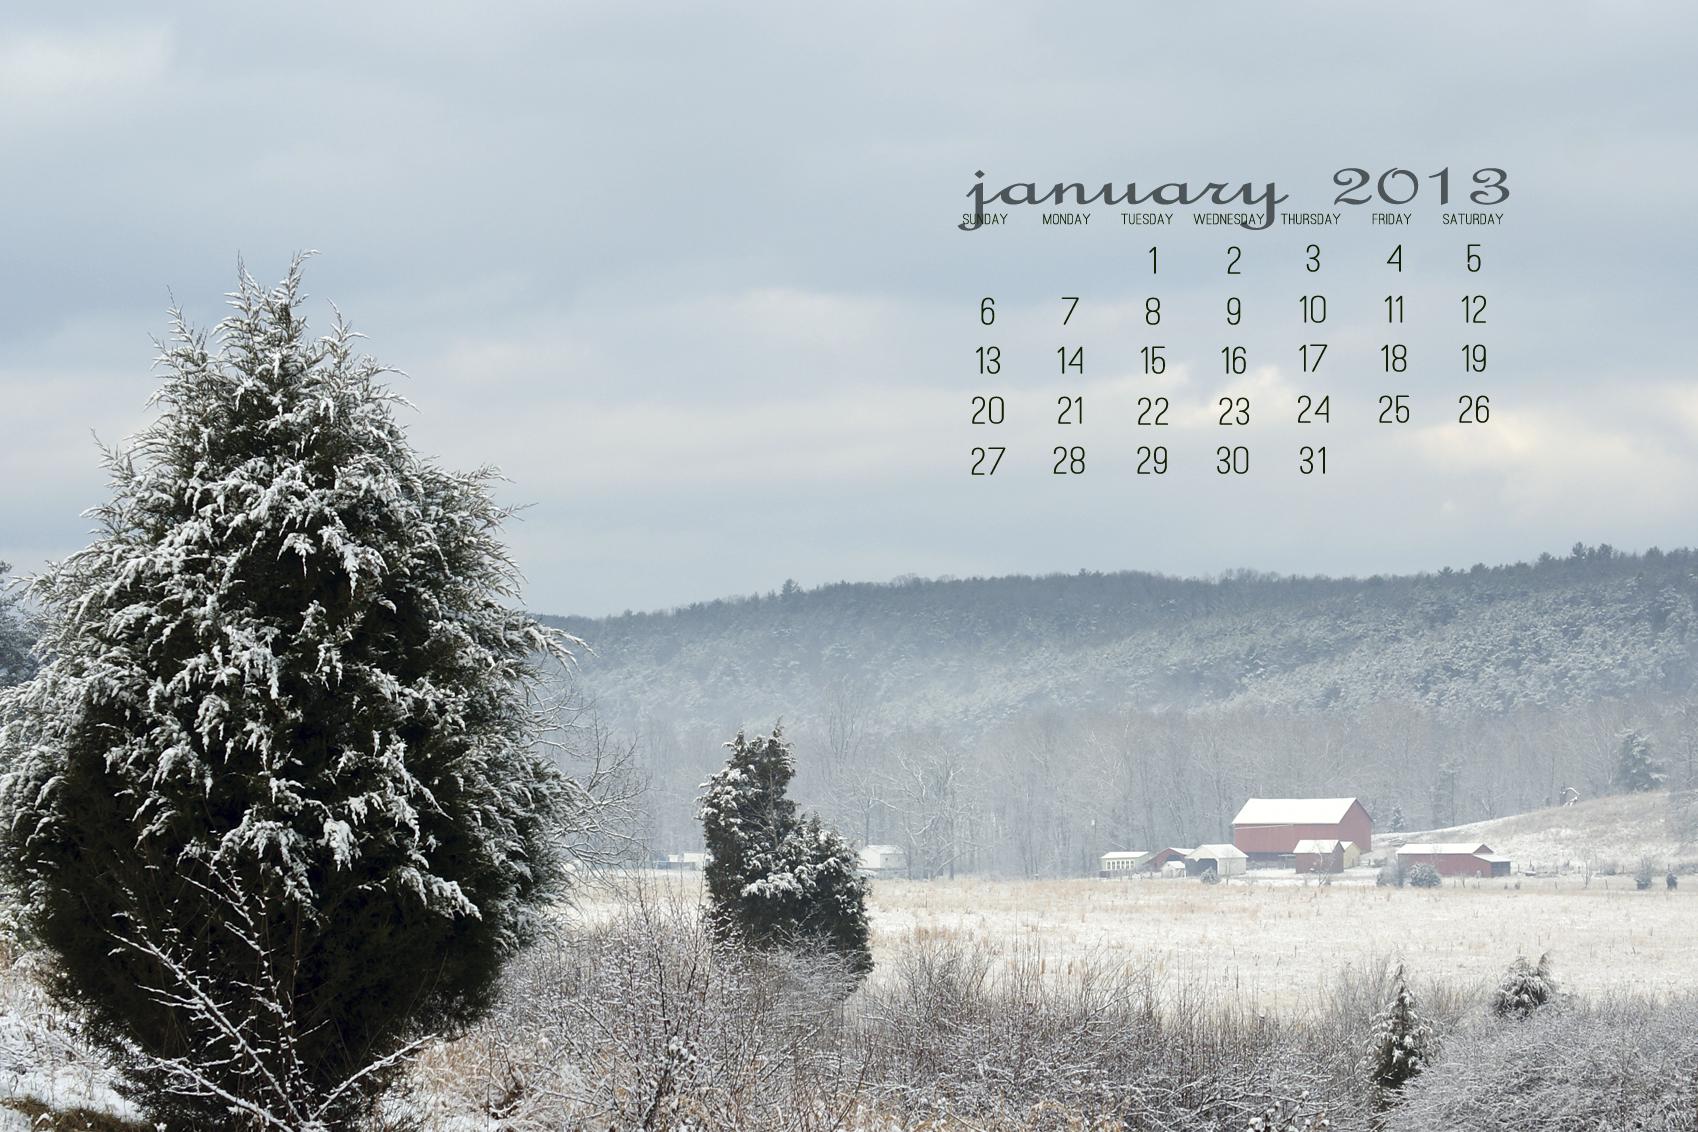 Calendar Wallpaper January Wallpapers Desktop Pictures 1698x1132